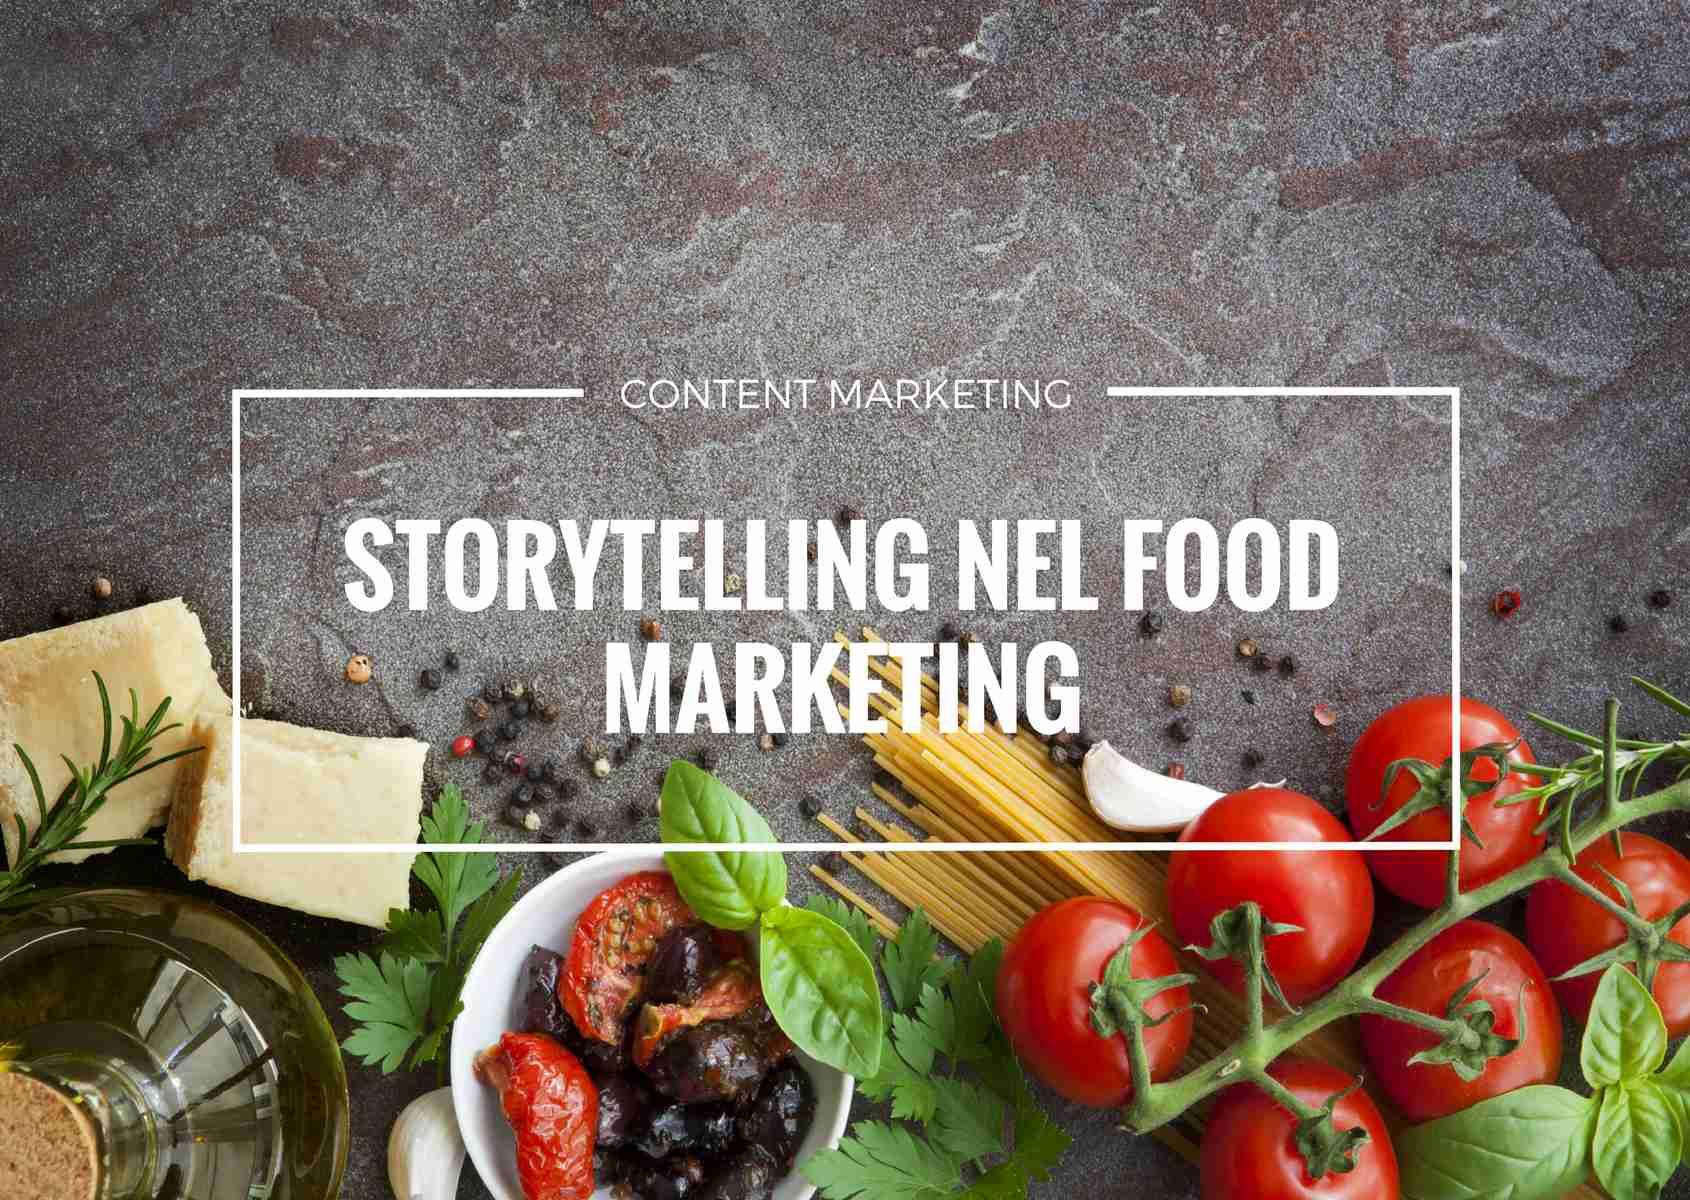 STORYTELLING-AZIENDALE-NEL-FOOD-MARKETING